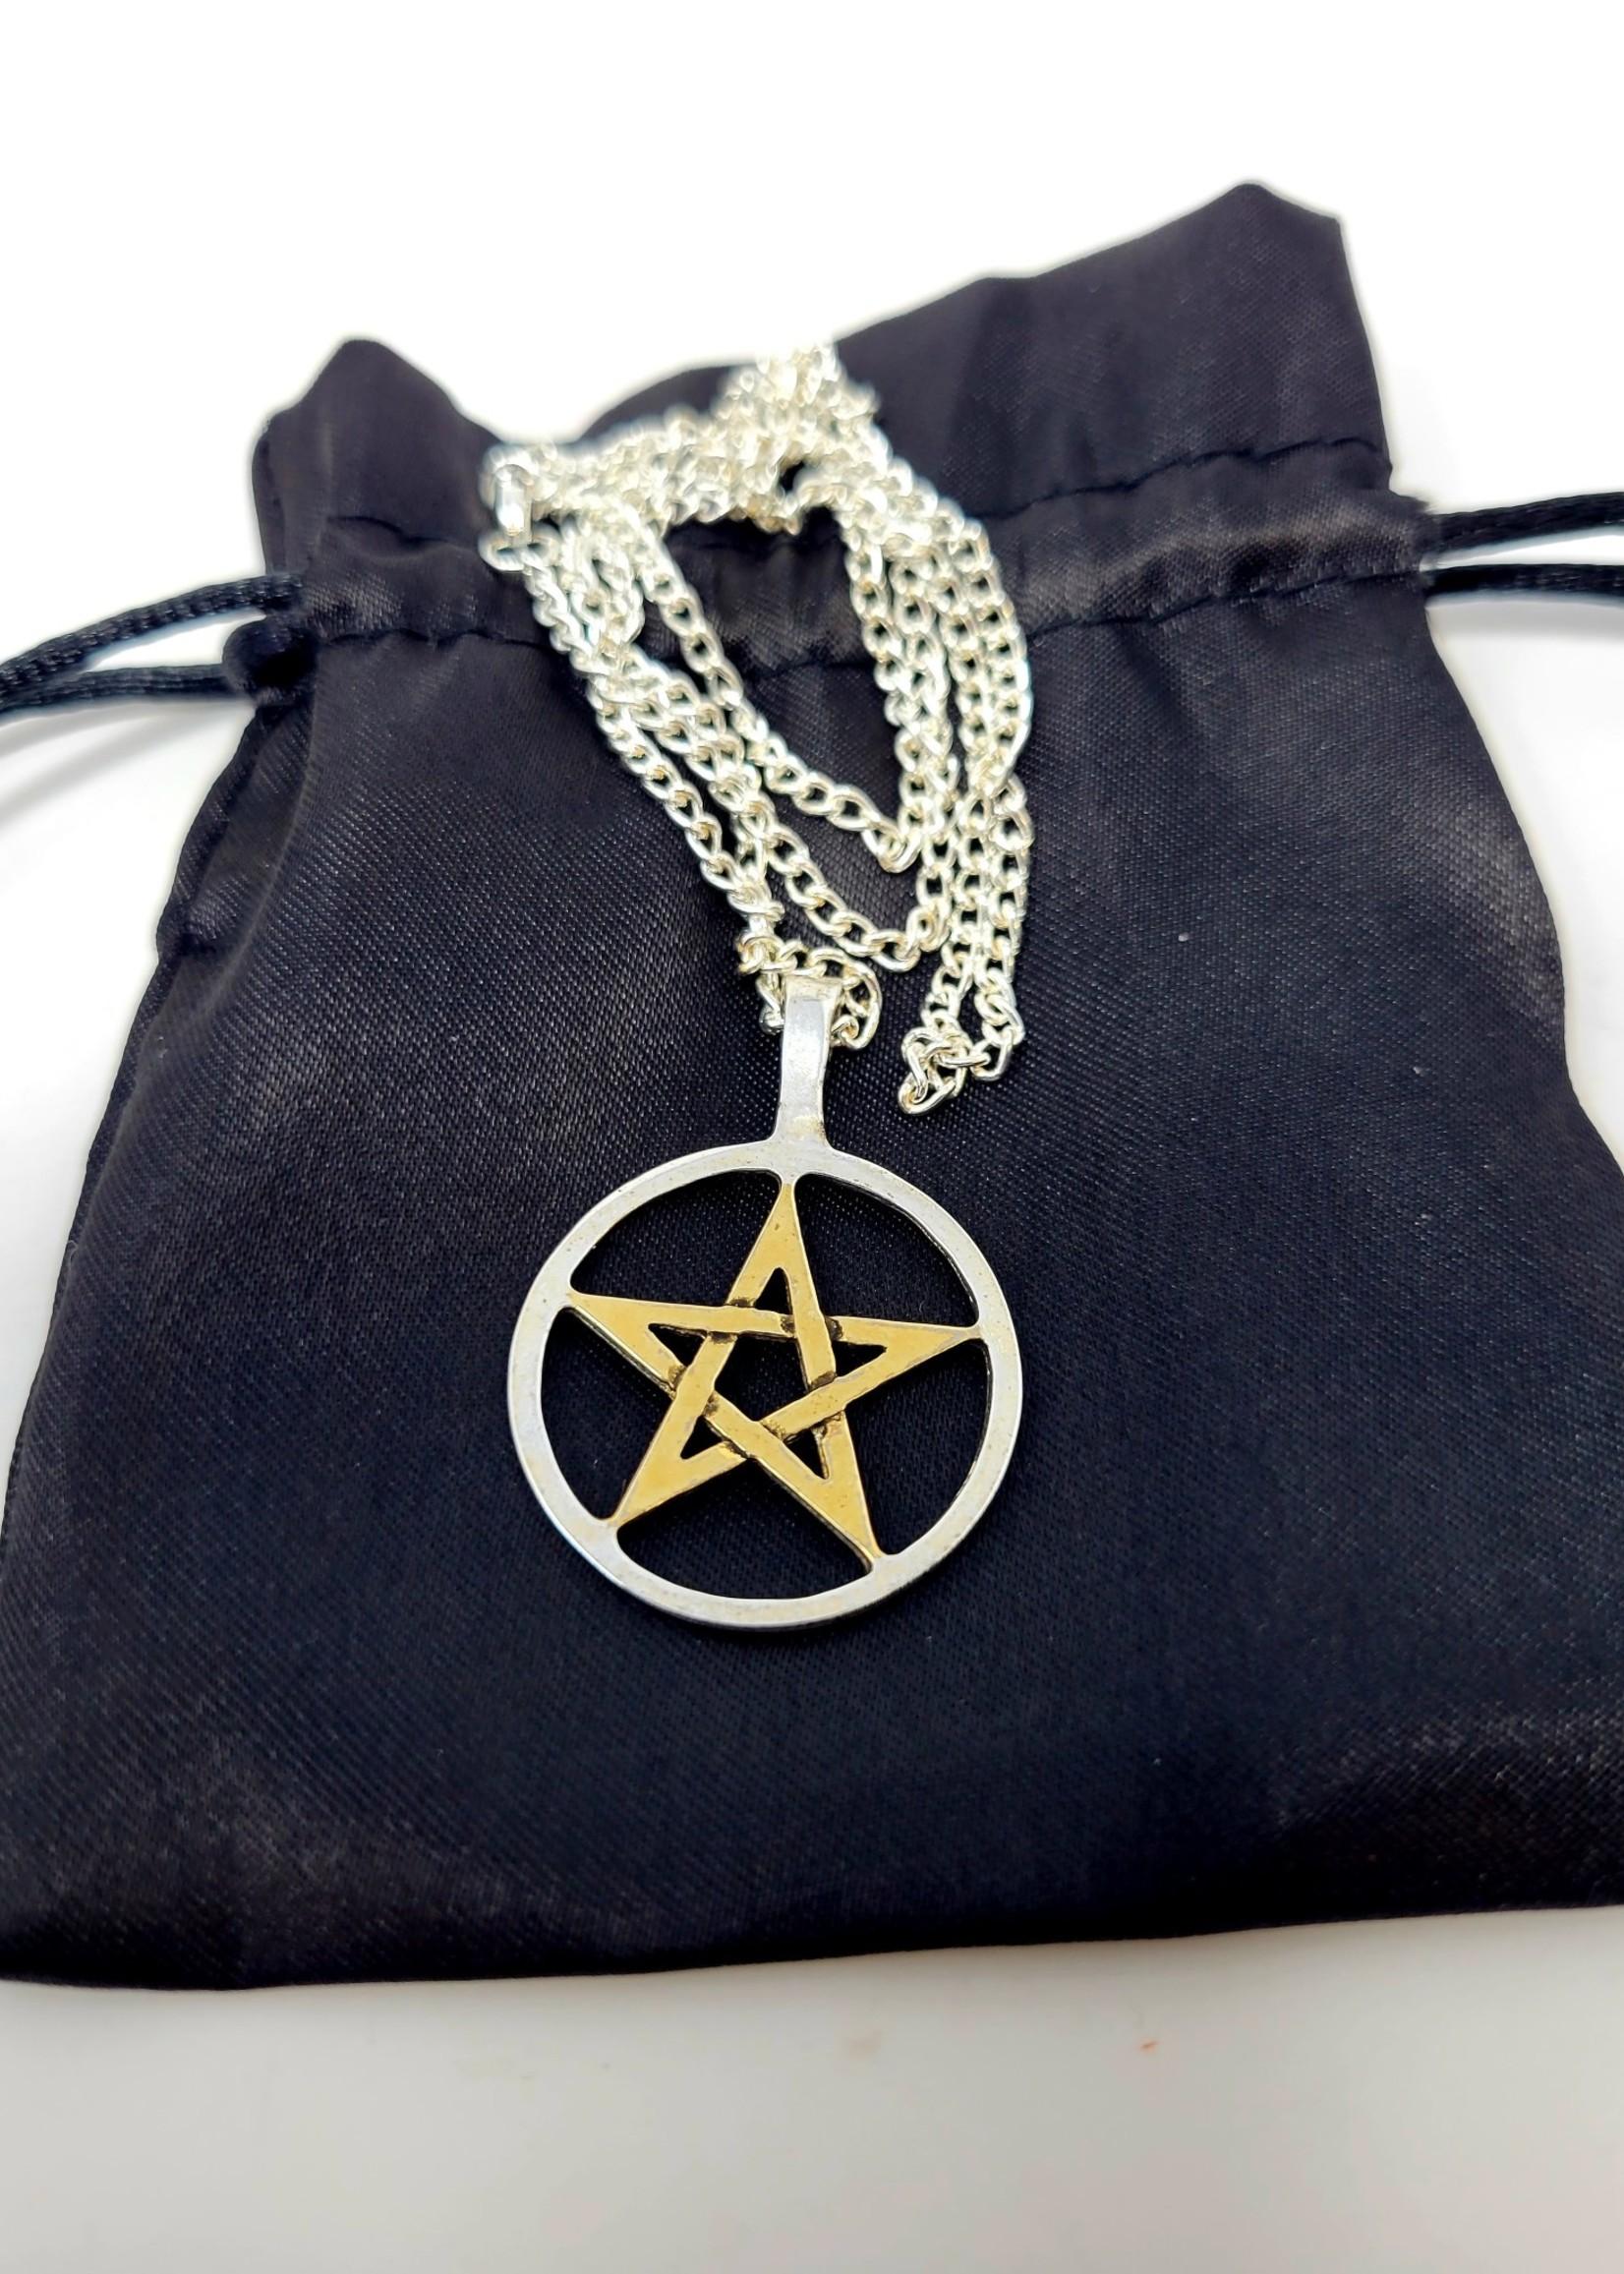 Pentagram For Balance & Harmony